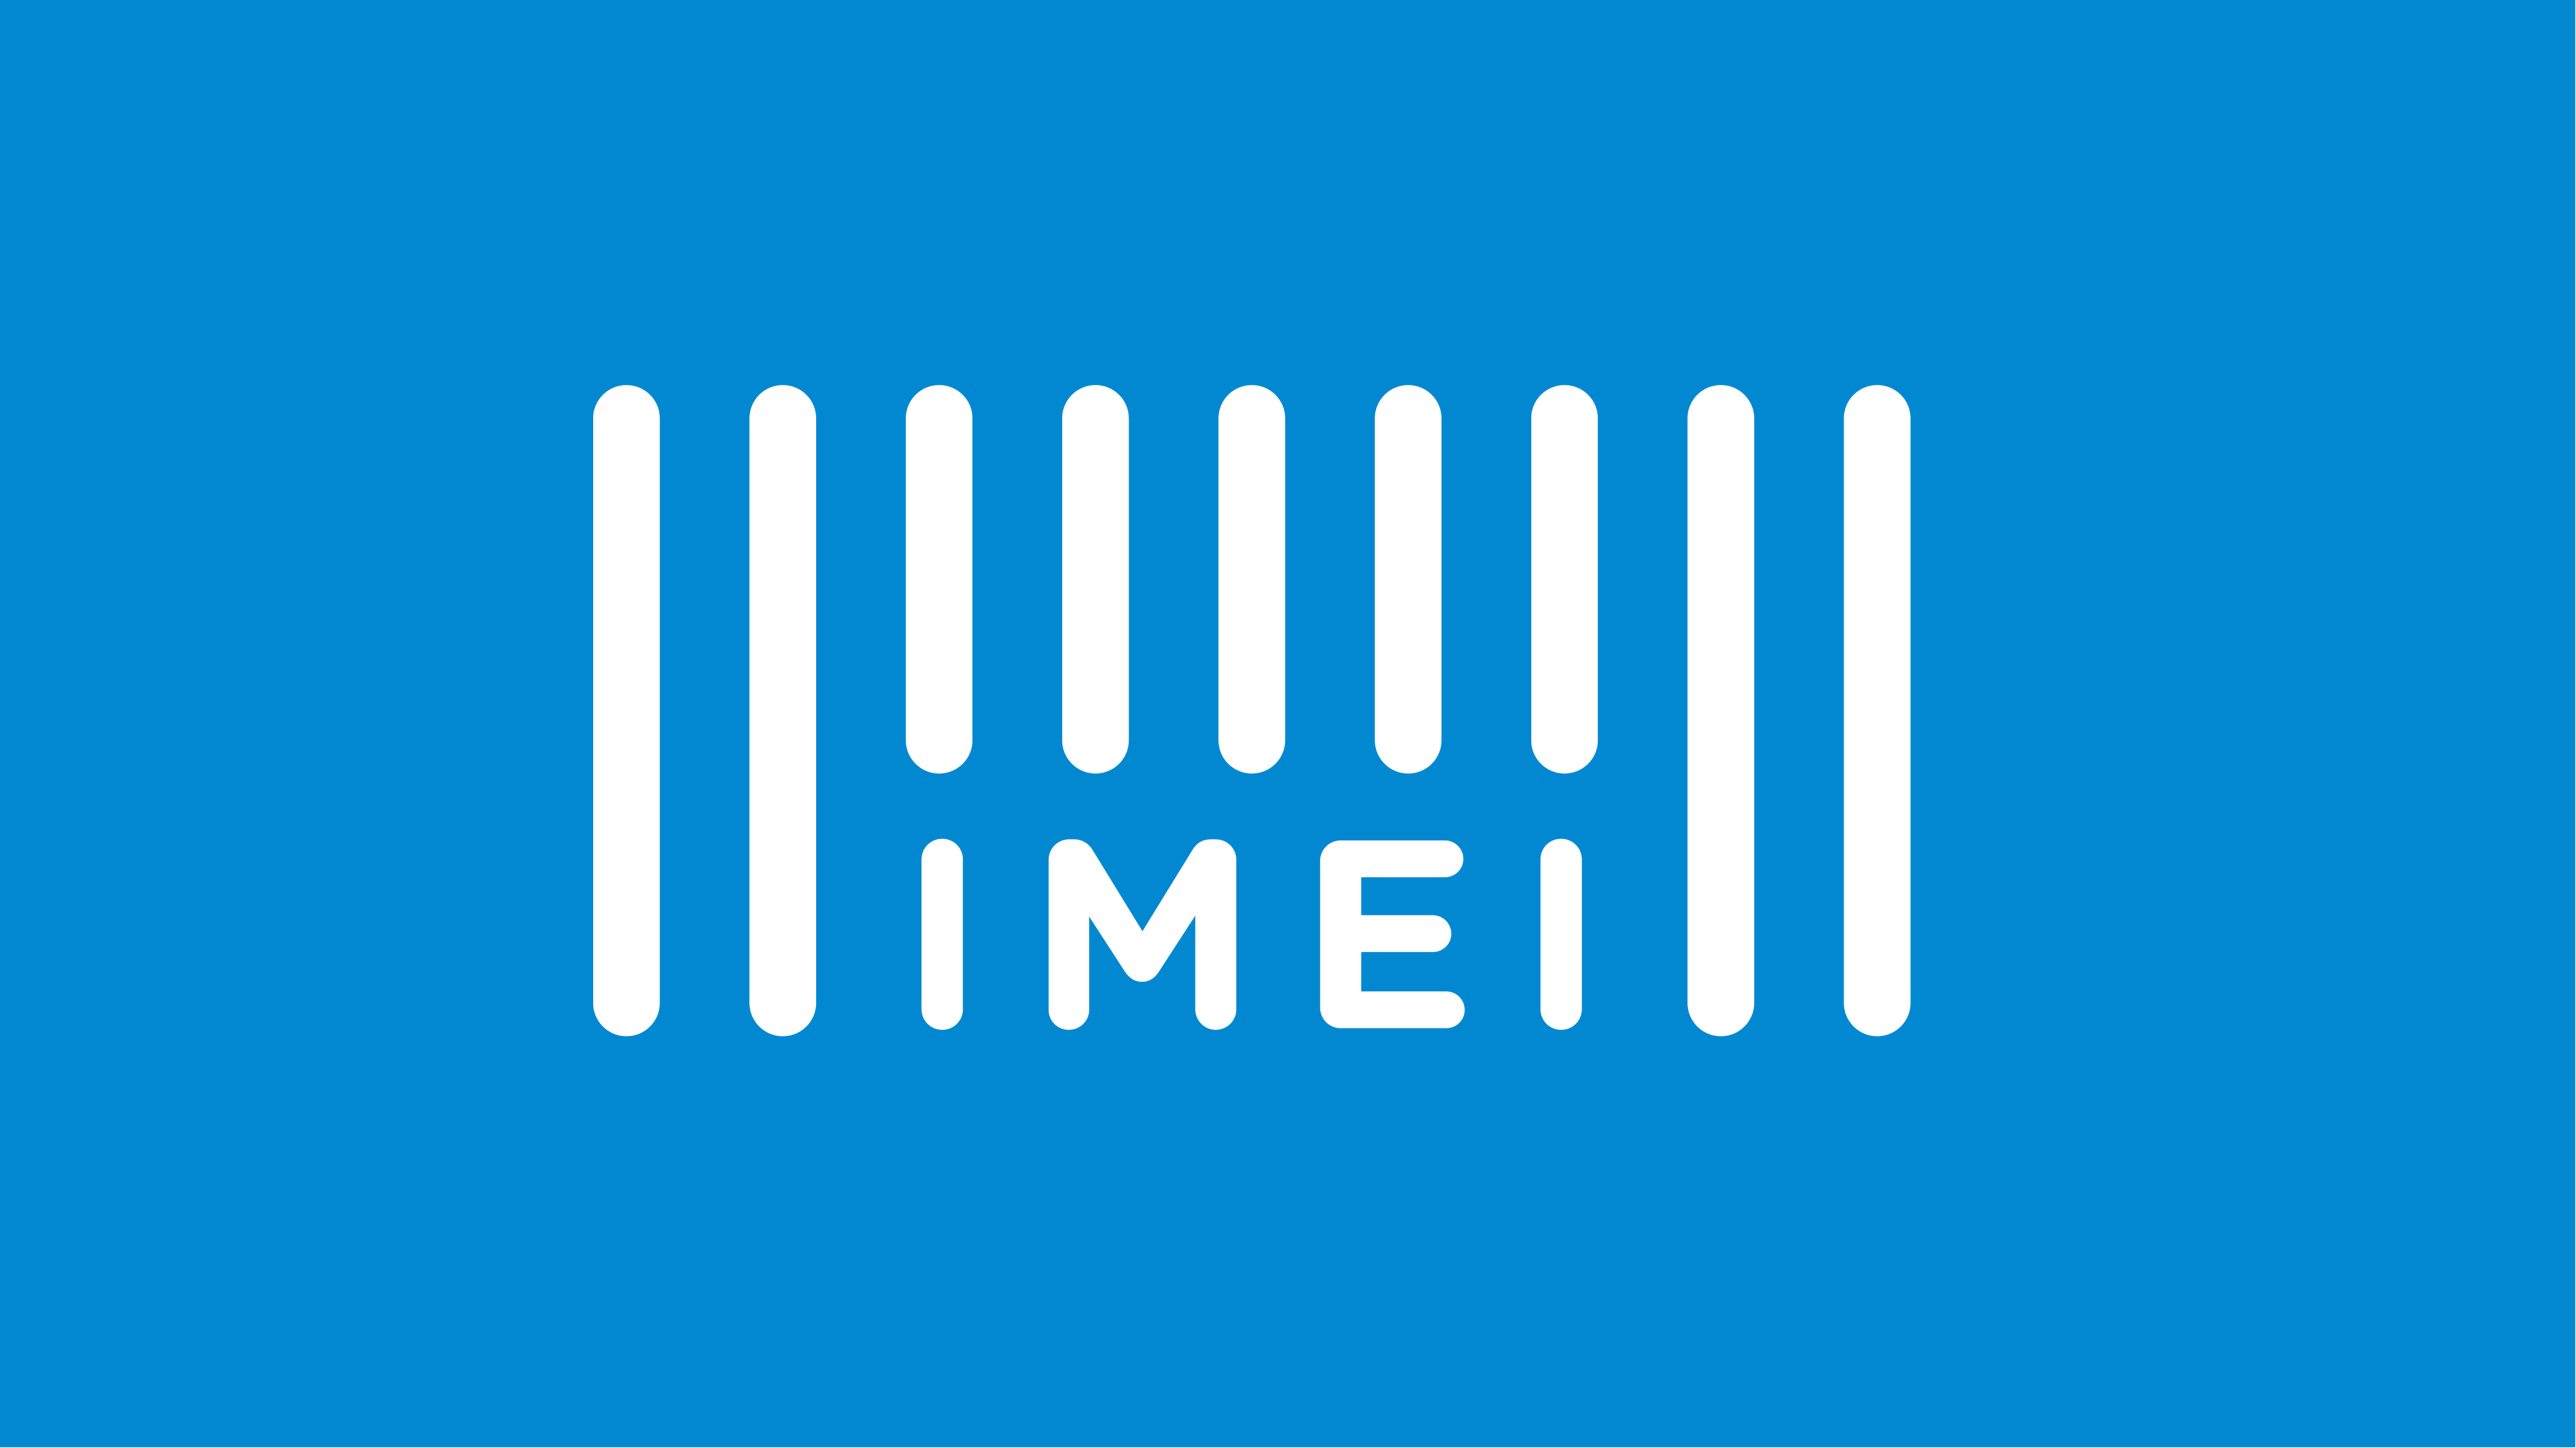 Como rastrear iPhone pelo iMEI?